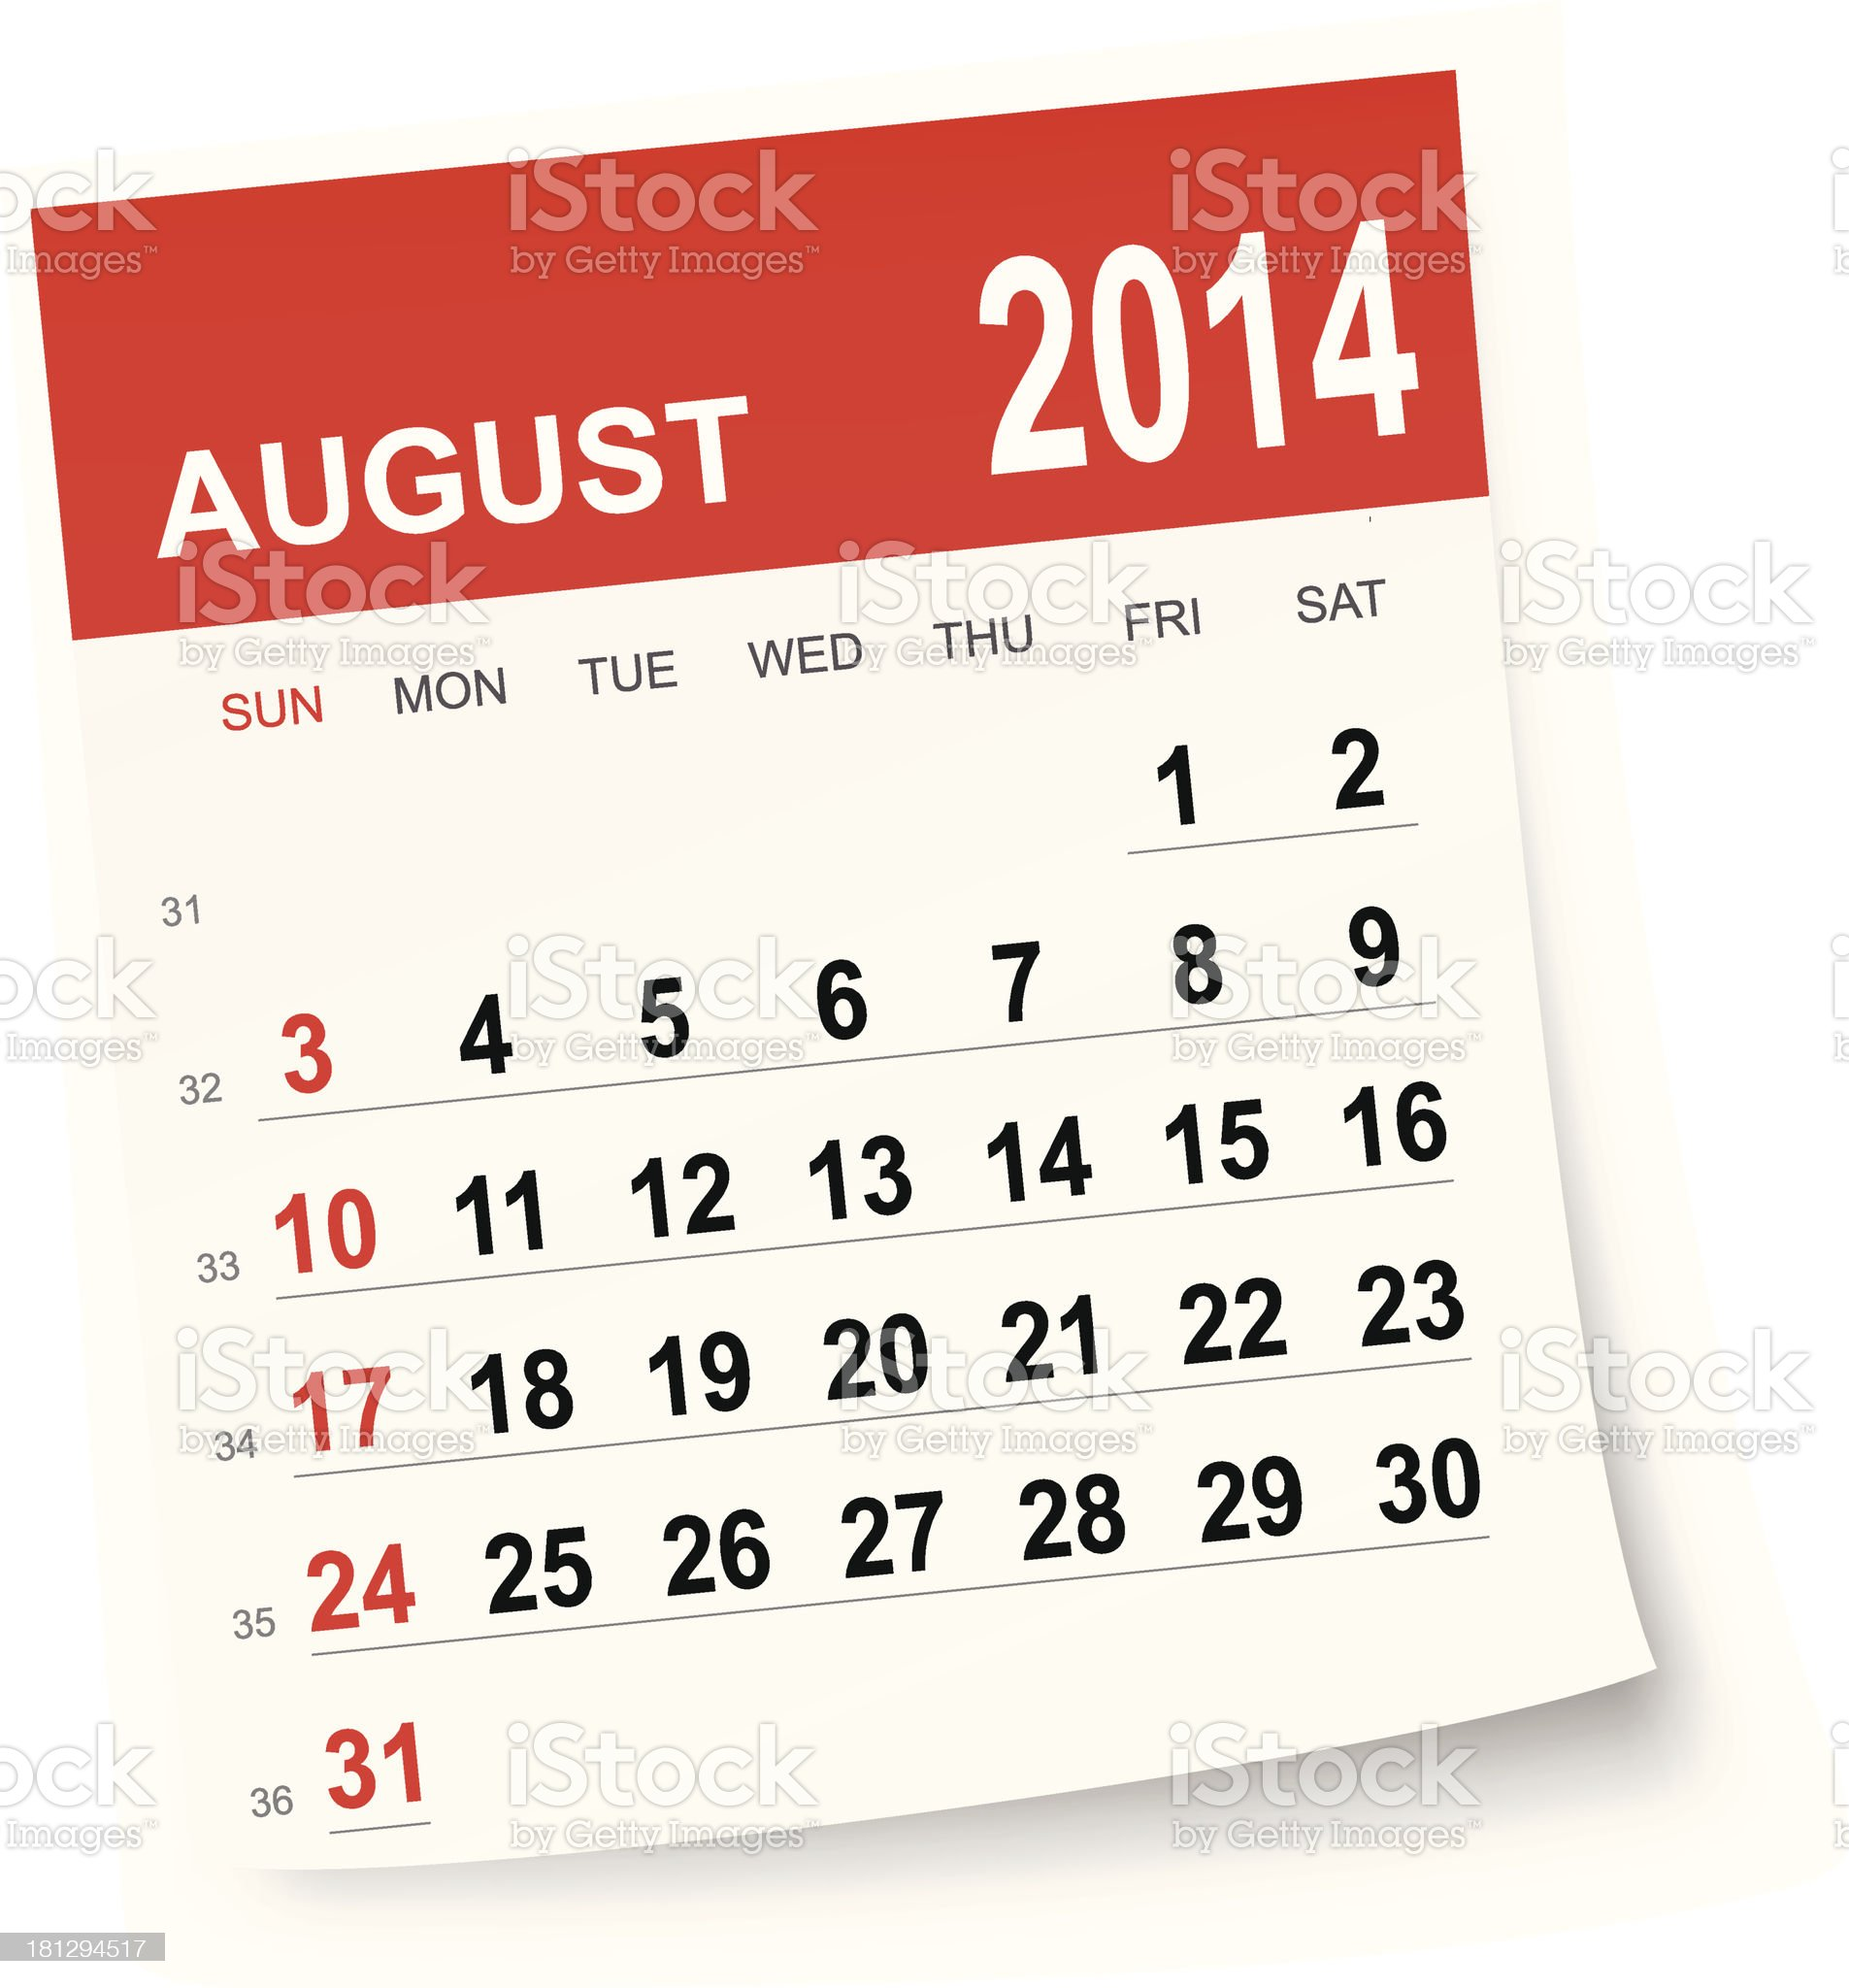 August 2014 calendar royalty-free stock vector art